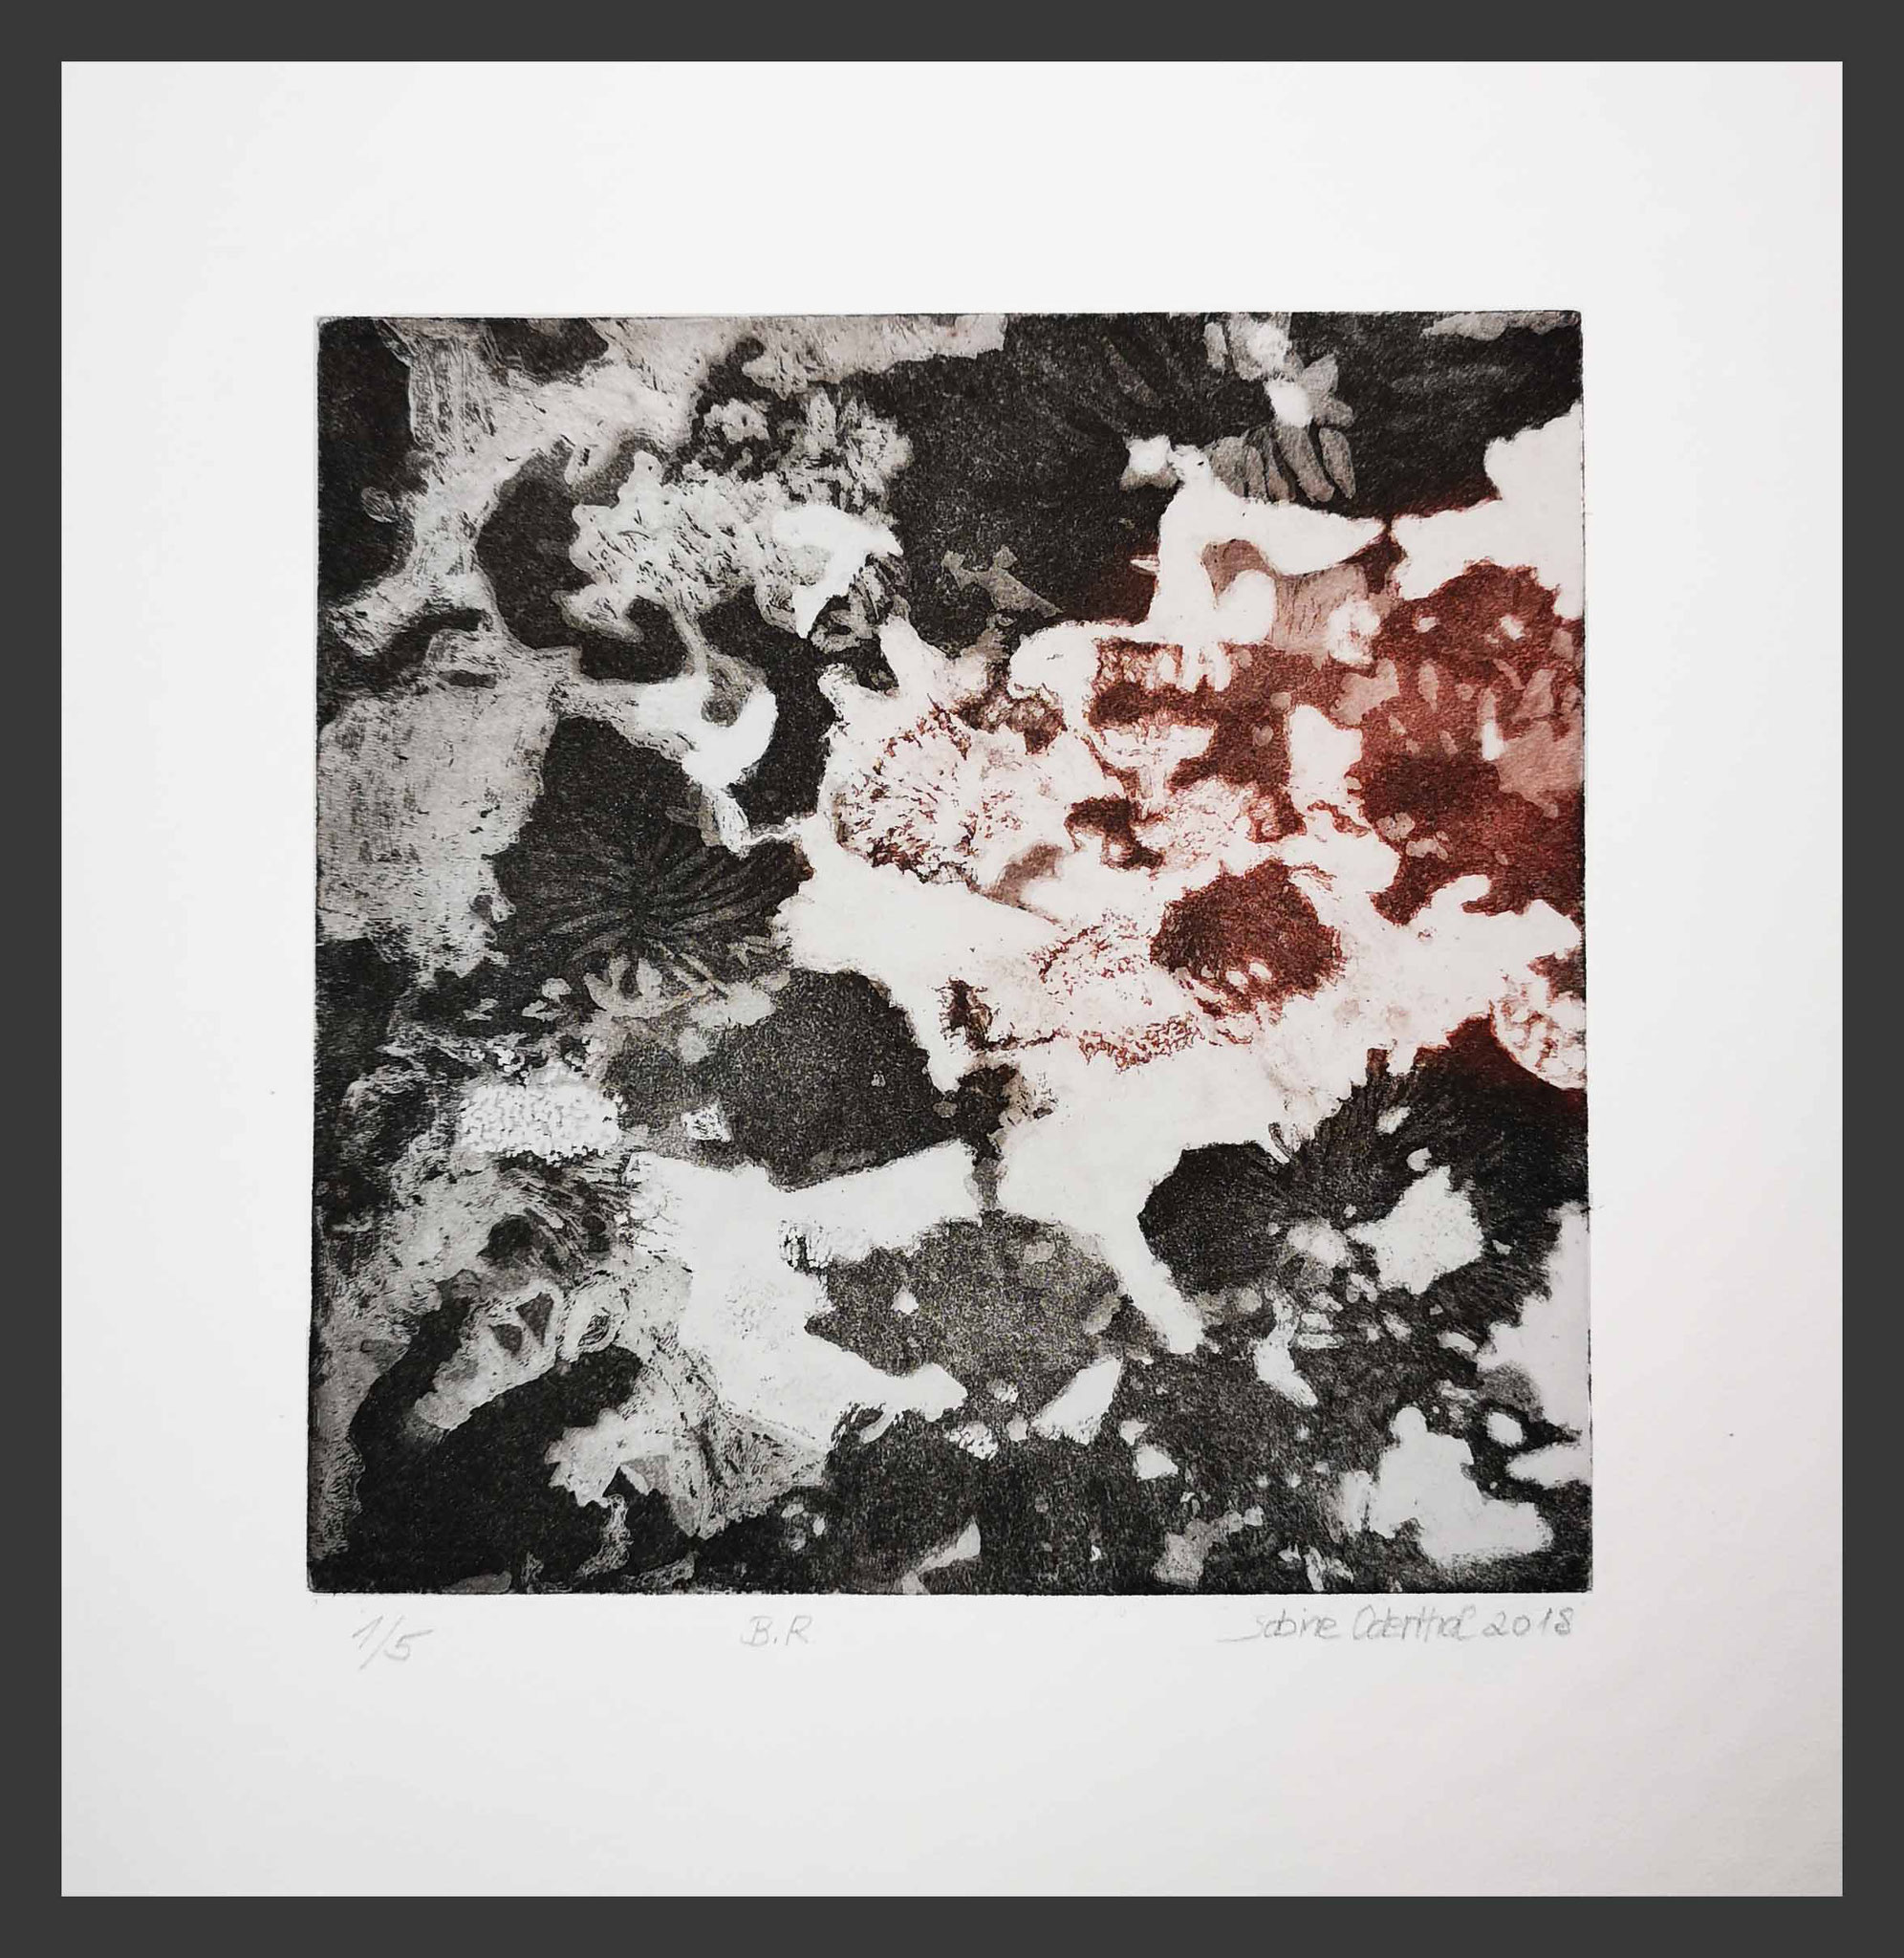 """B.R""  Pflanzen Abstraktion  Aquatinta Radierung 2018  20 cm x 20 cm  auf 32 x 32 cm Flachspapier"